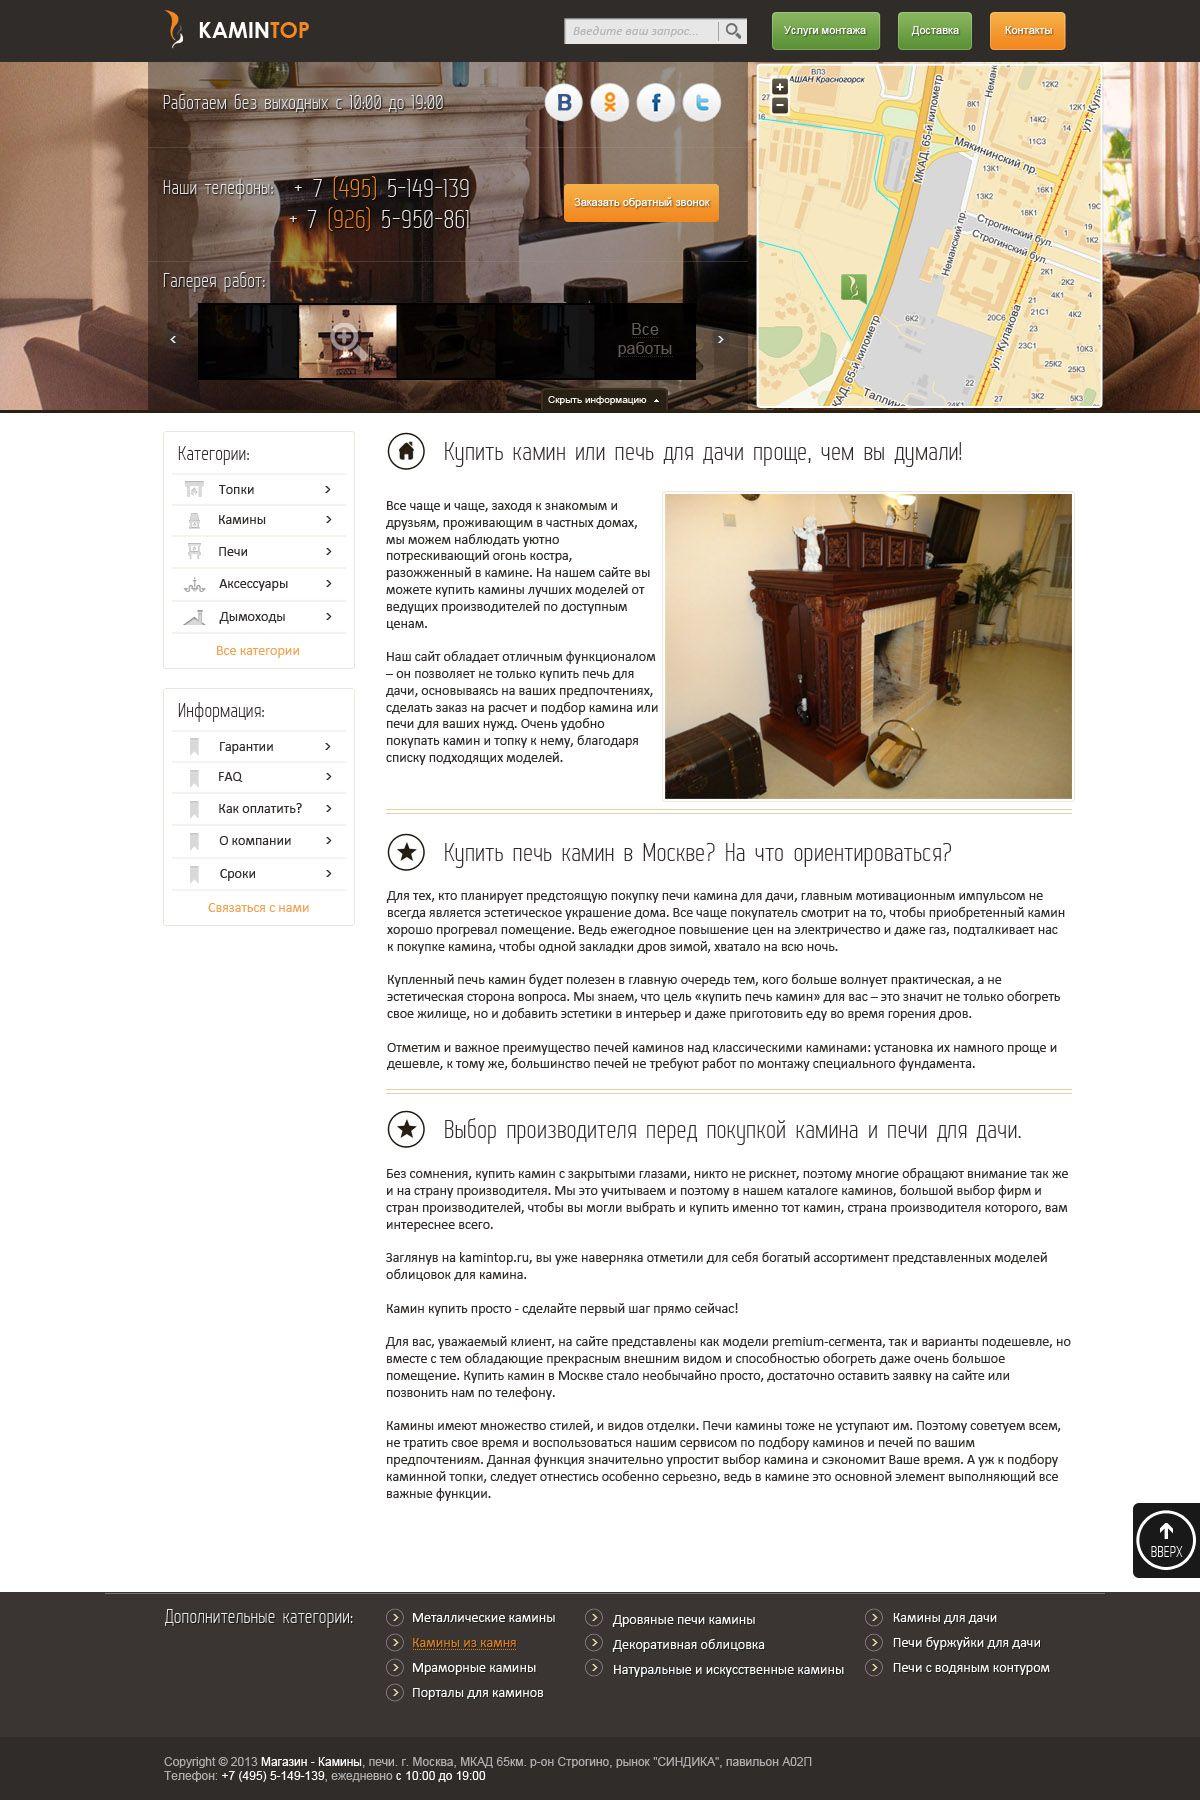 Дизайн сайта интернет магазина - дизайнер Likann